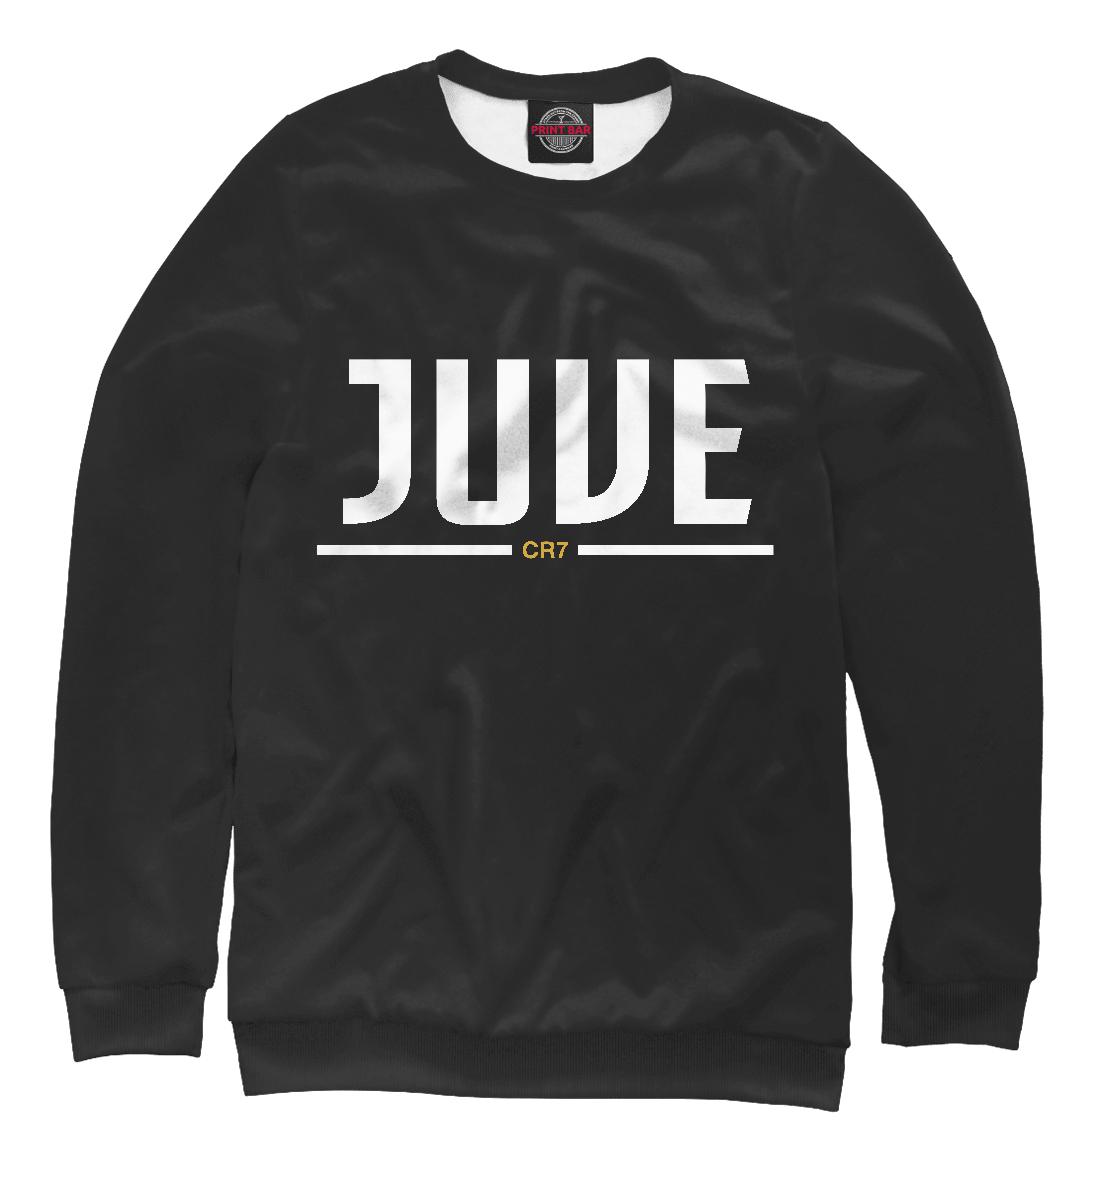 Купить Juventus - CR7, Printbar, Свитшоты, JUV-145816-swi-1